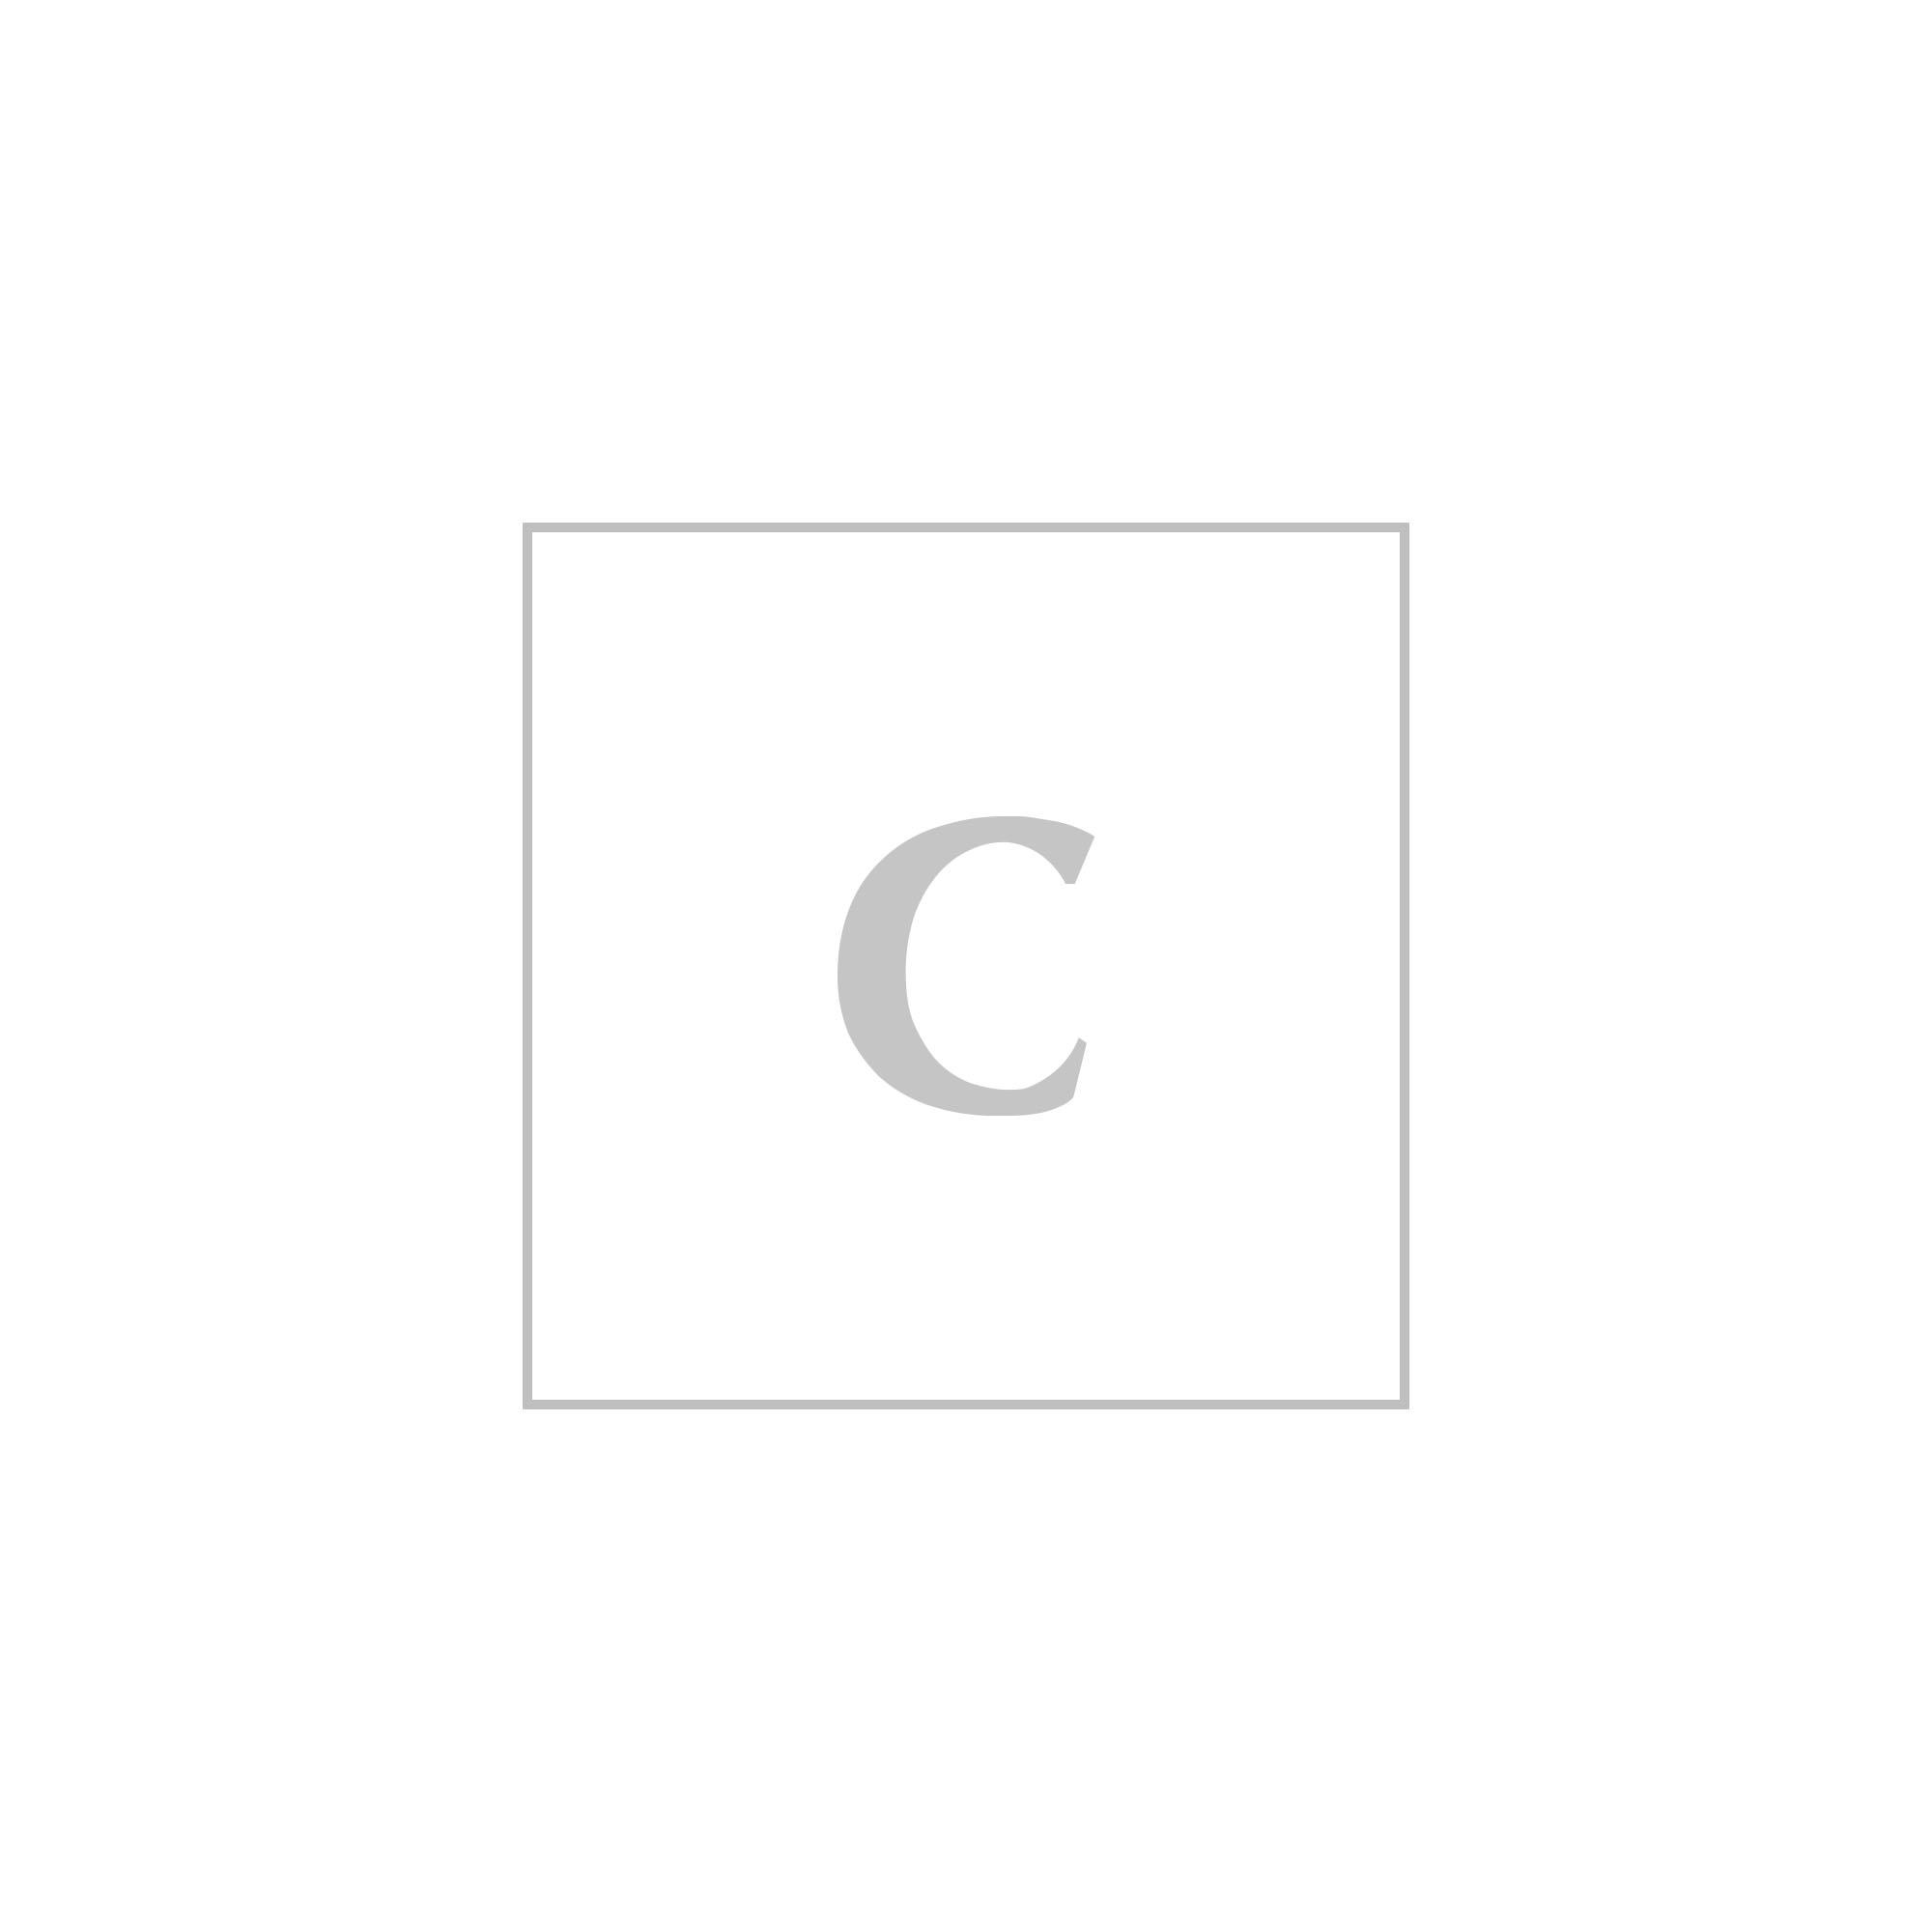 Saint laurent monogram mini clutch